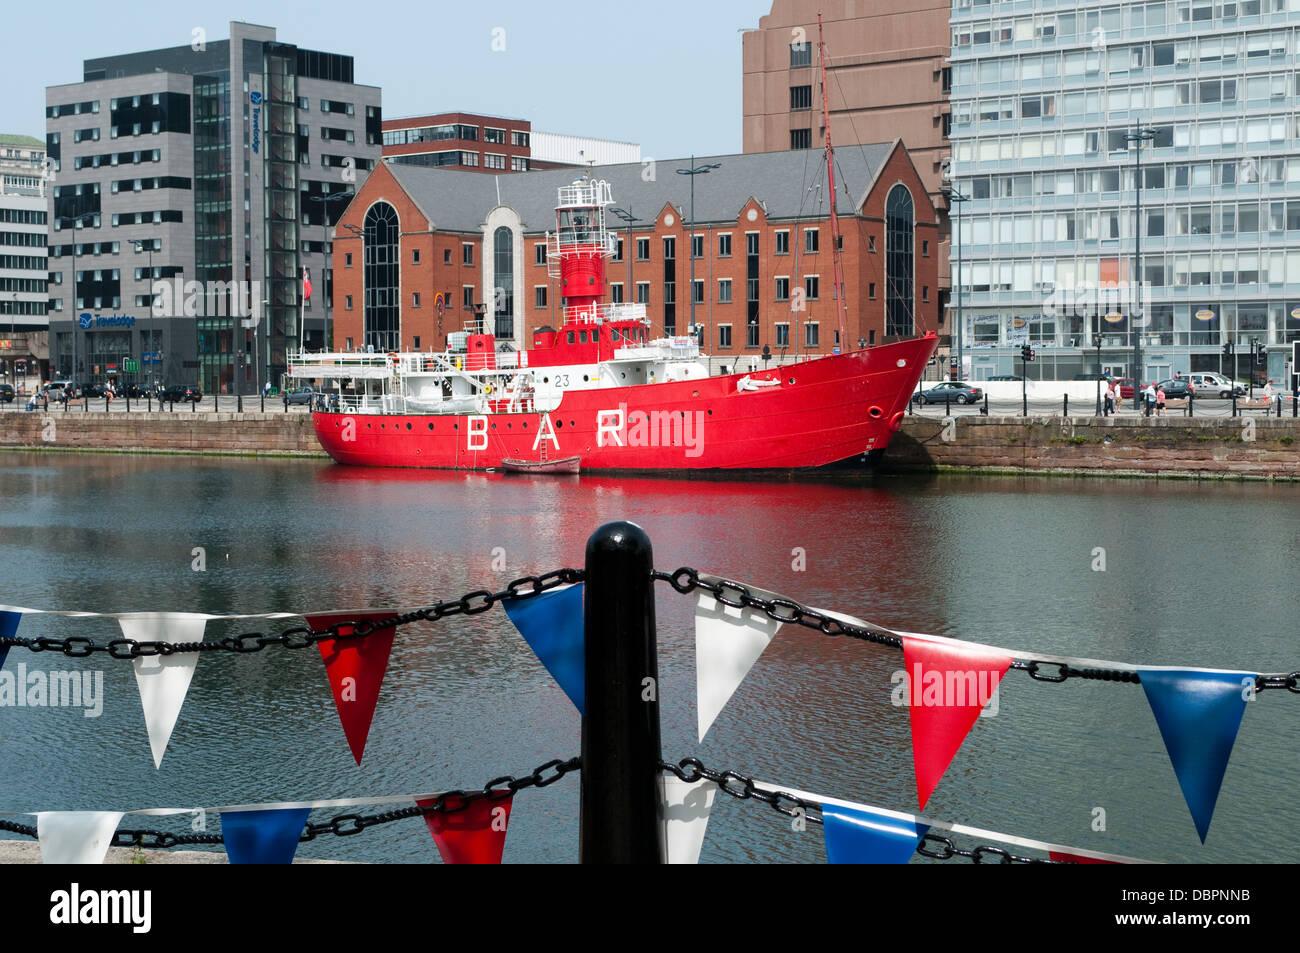 Barco Bar, astucia Dock, Liverpool, Reino Unido Imagen De Stock